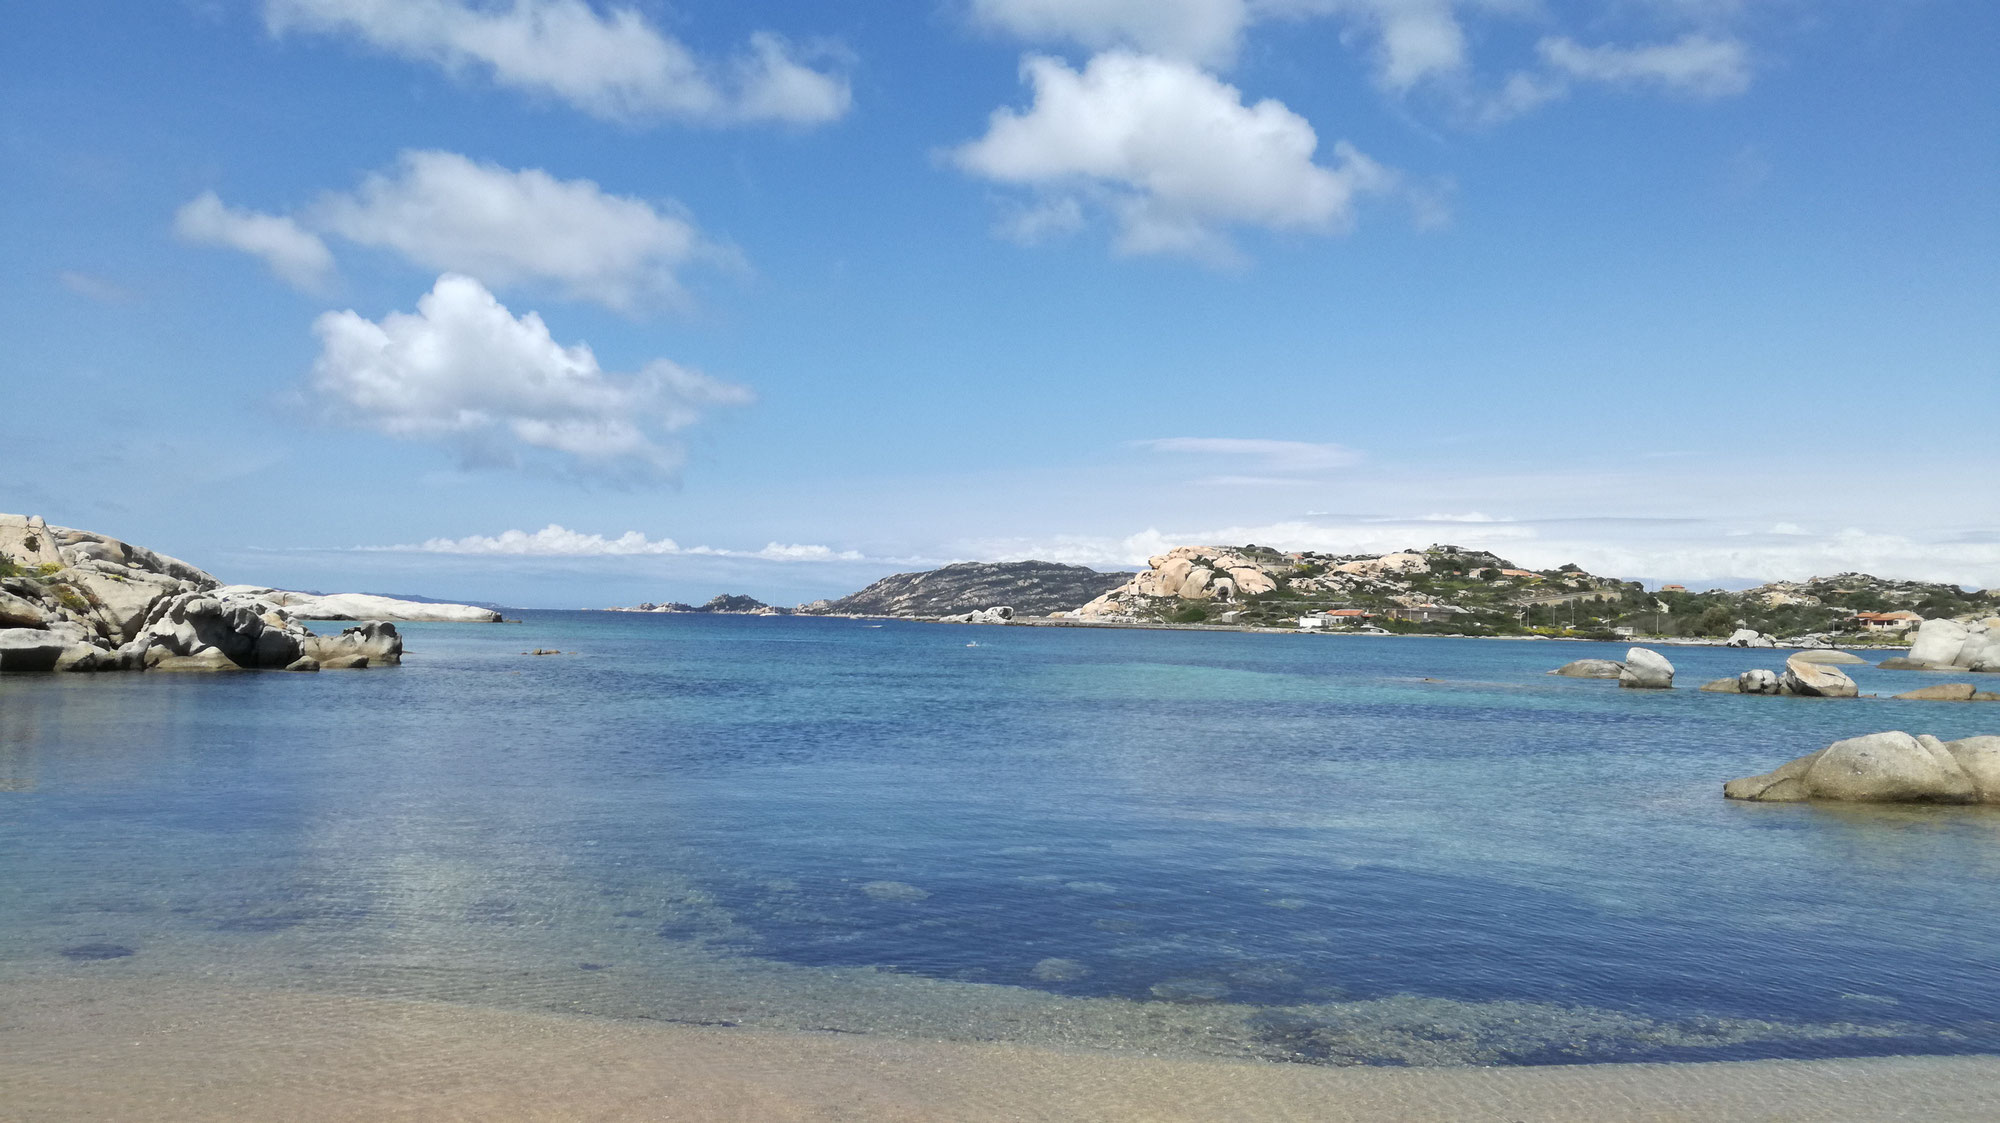 La Maddalena - Ein Paradies im Mittelmeer